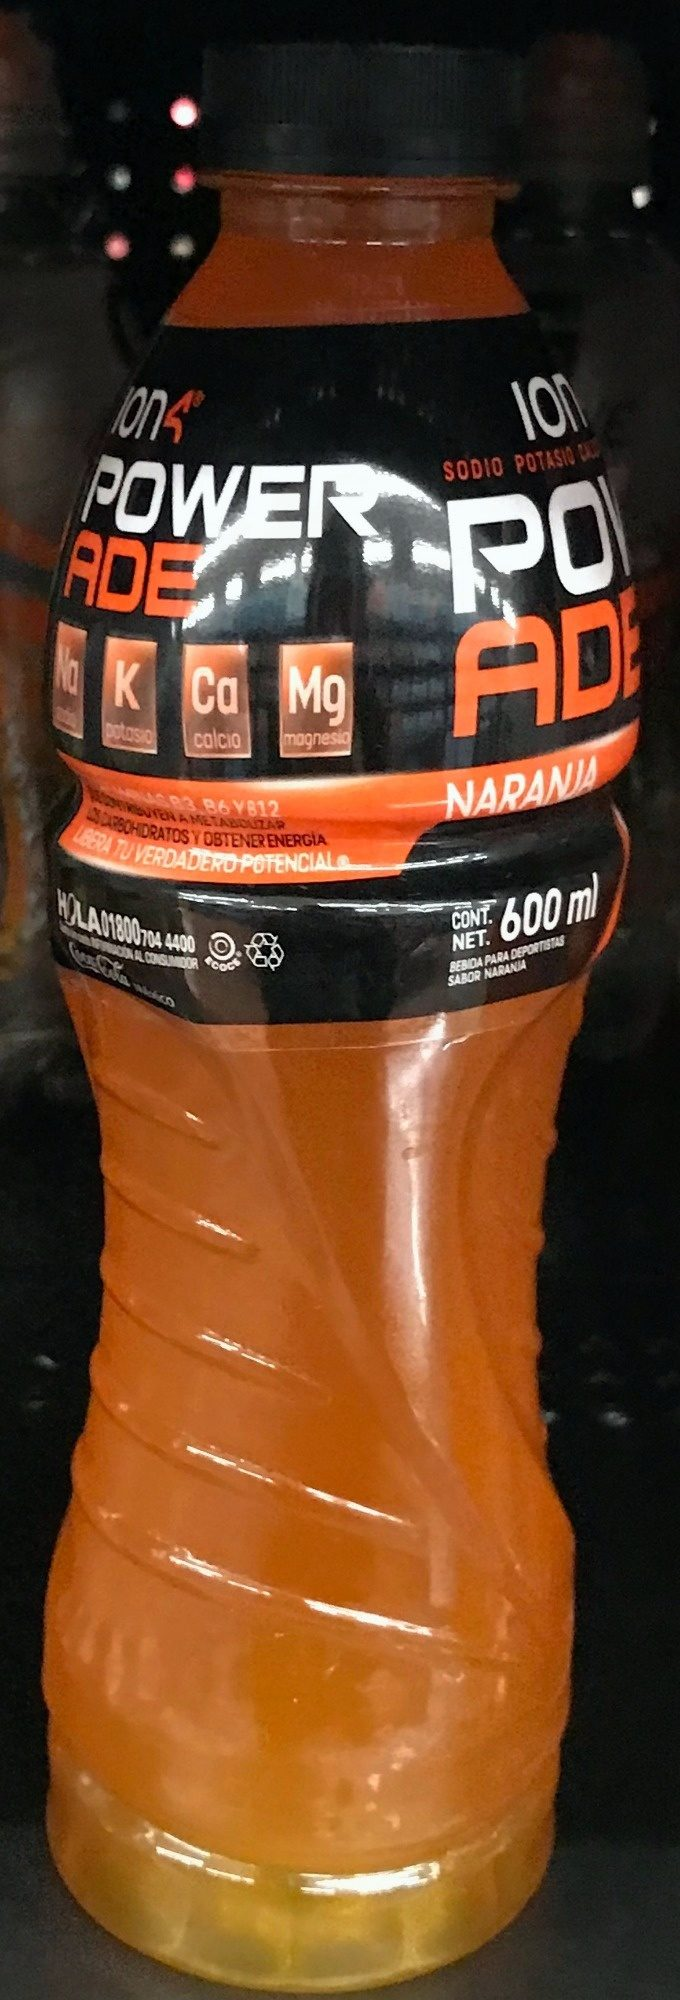 Powerade Ion 4 Naranja - Product